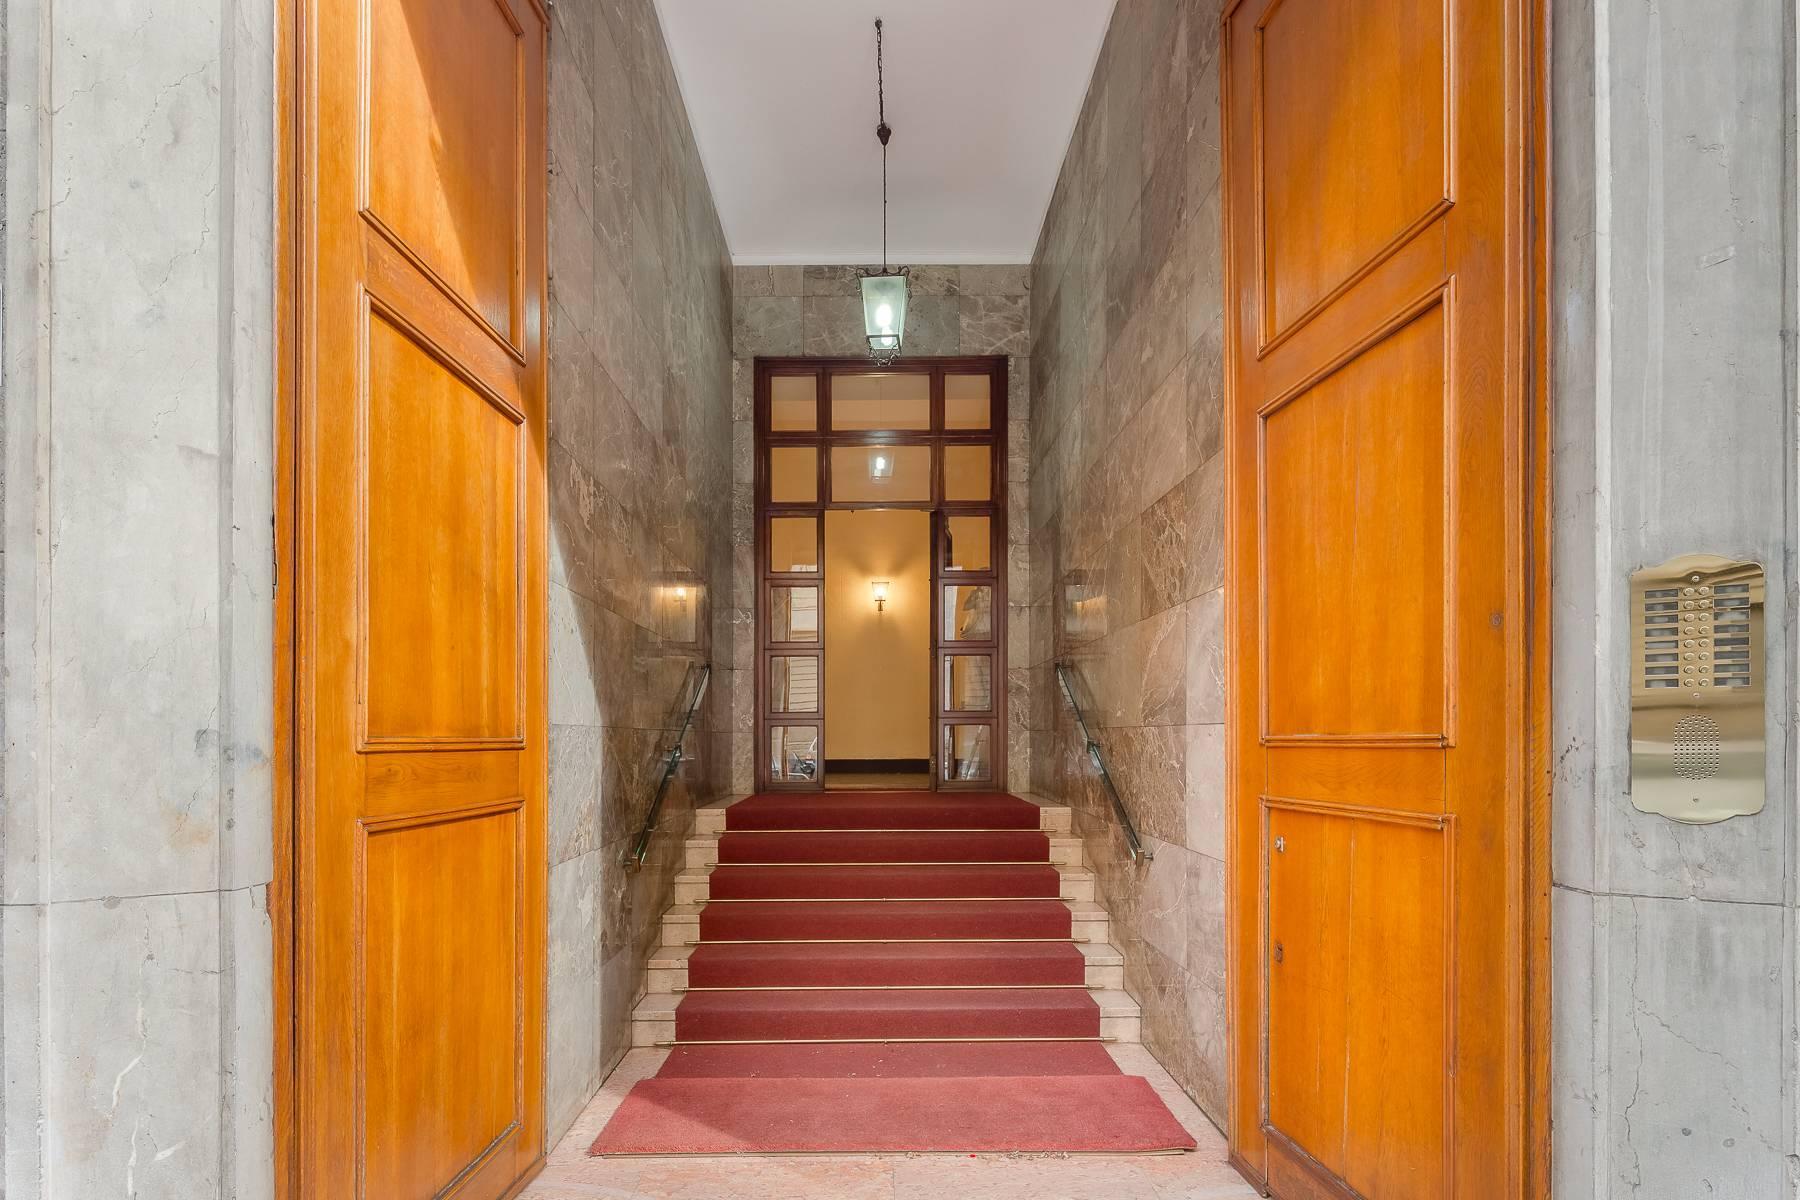 Open space office/residential property in Piazza Giovine Italia/Via Aurelio Saffi - 1